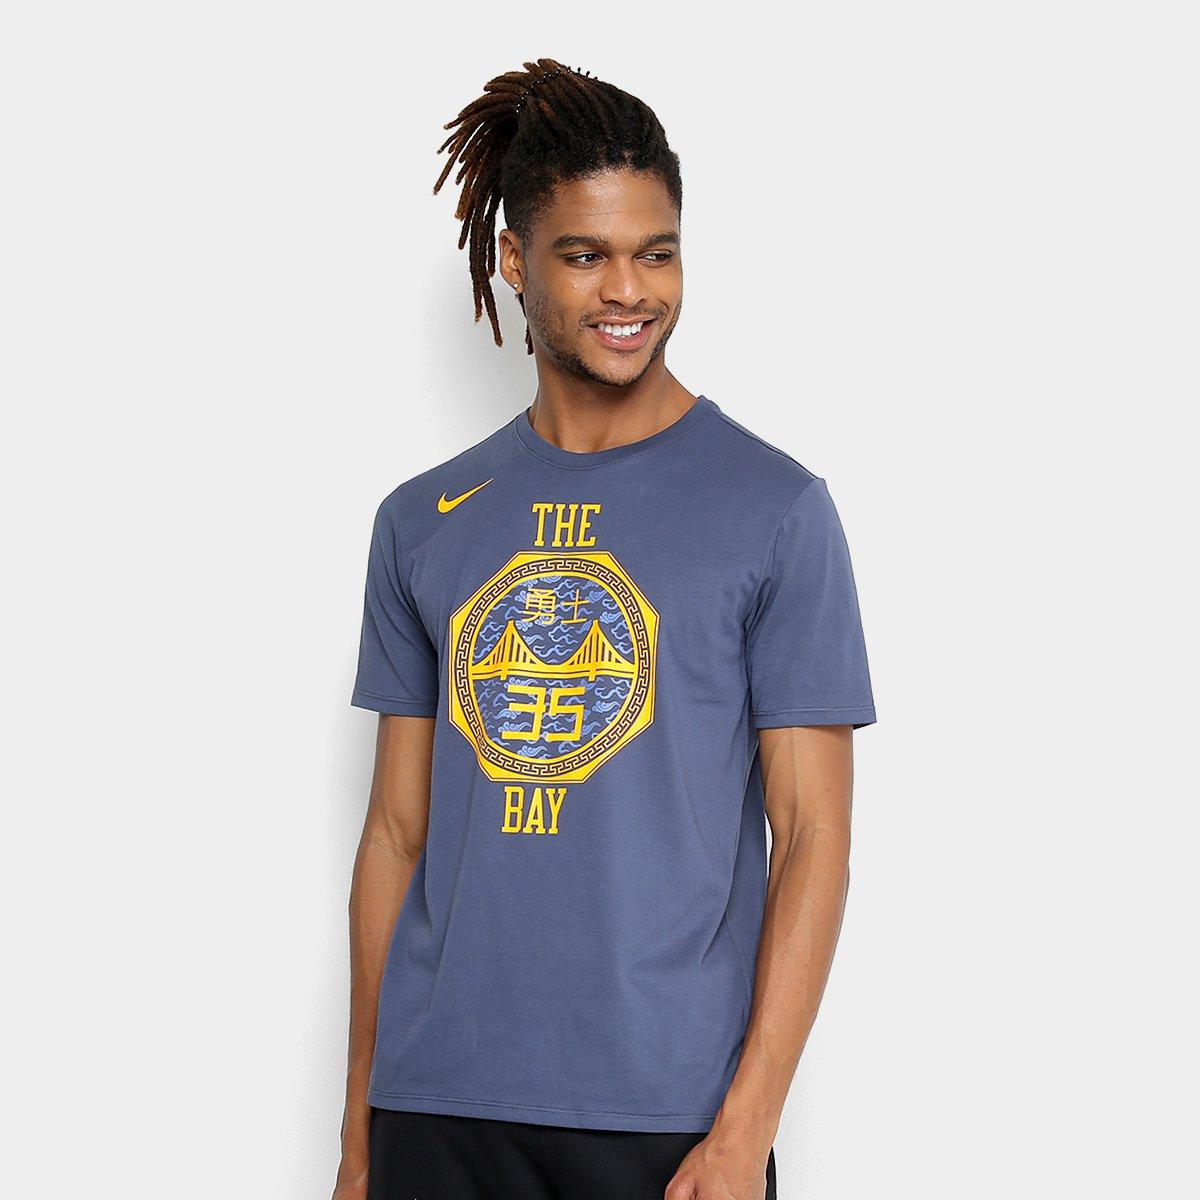 Medalla Espinas Fundir  Camiseta NBA Golden State Warriors Kevin Durant Nike City Edition Masculina  | Loja NBA